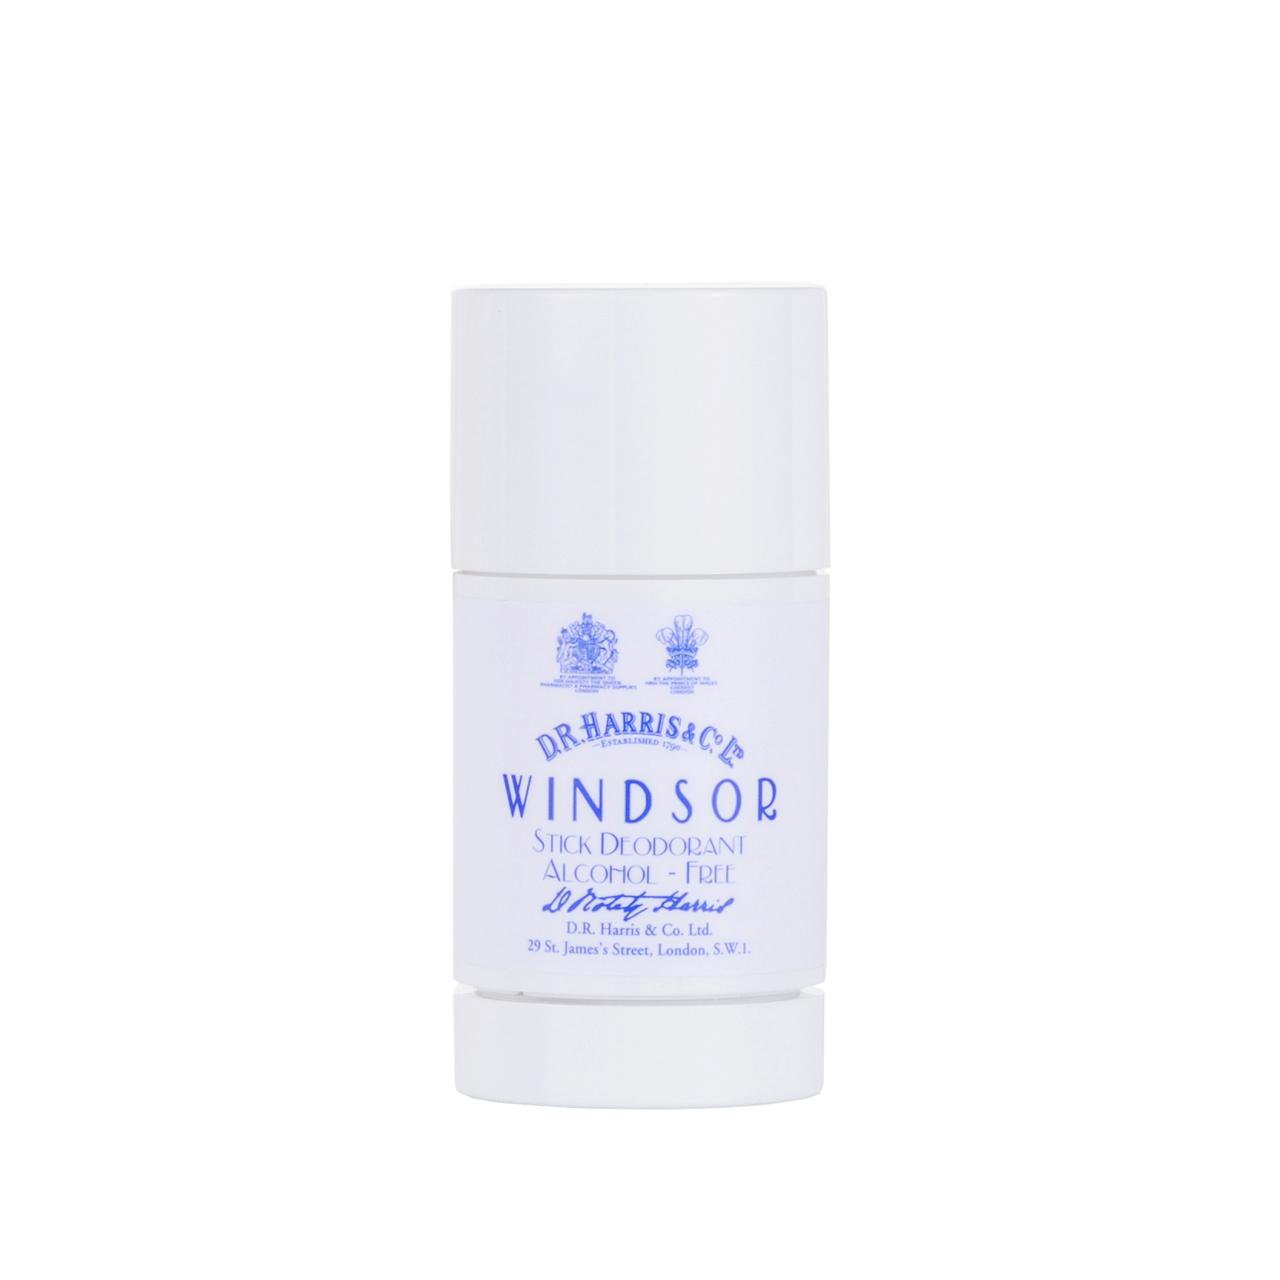 Windsor - Deodorant Stick Alcohol Free